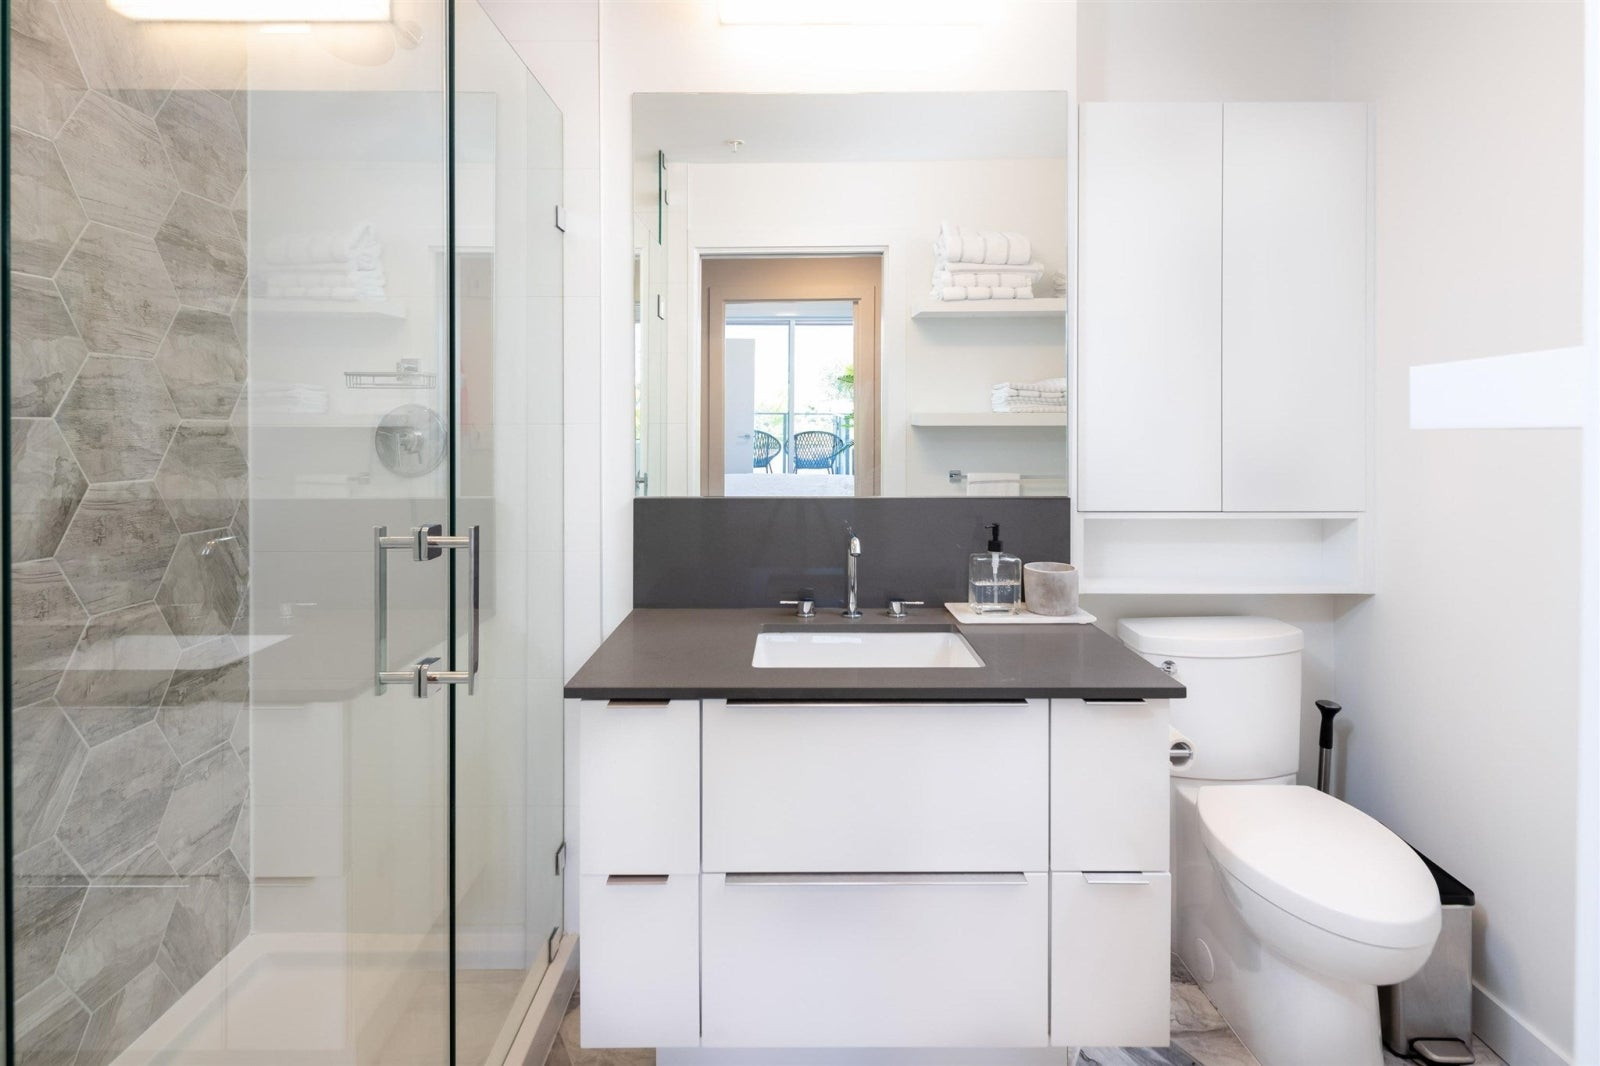 408 379 E BROADWAY AVENUE - Mount Pleasant VE Apartment/Condo for sale, 2 Bedrooms (R2599900) #19